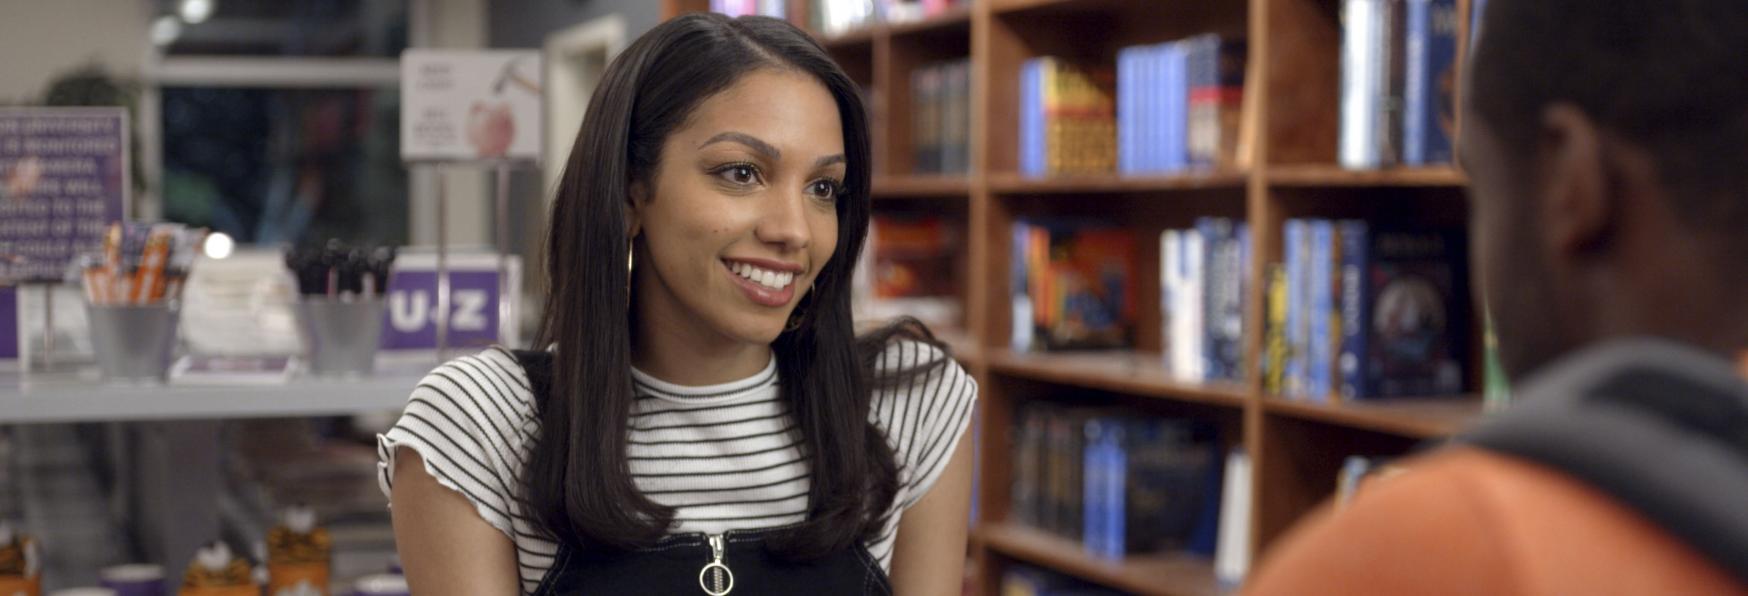 Dollface 2: Corinne Foxx si unisce al Cast della Serie TV Comedy di Hulu